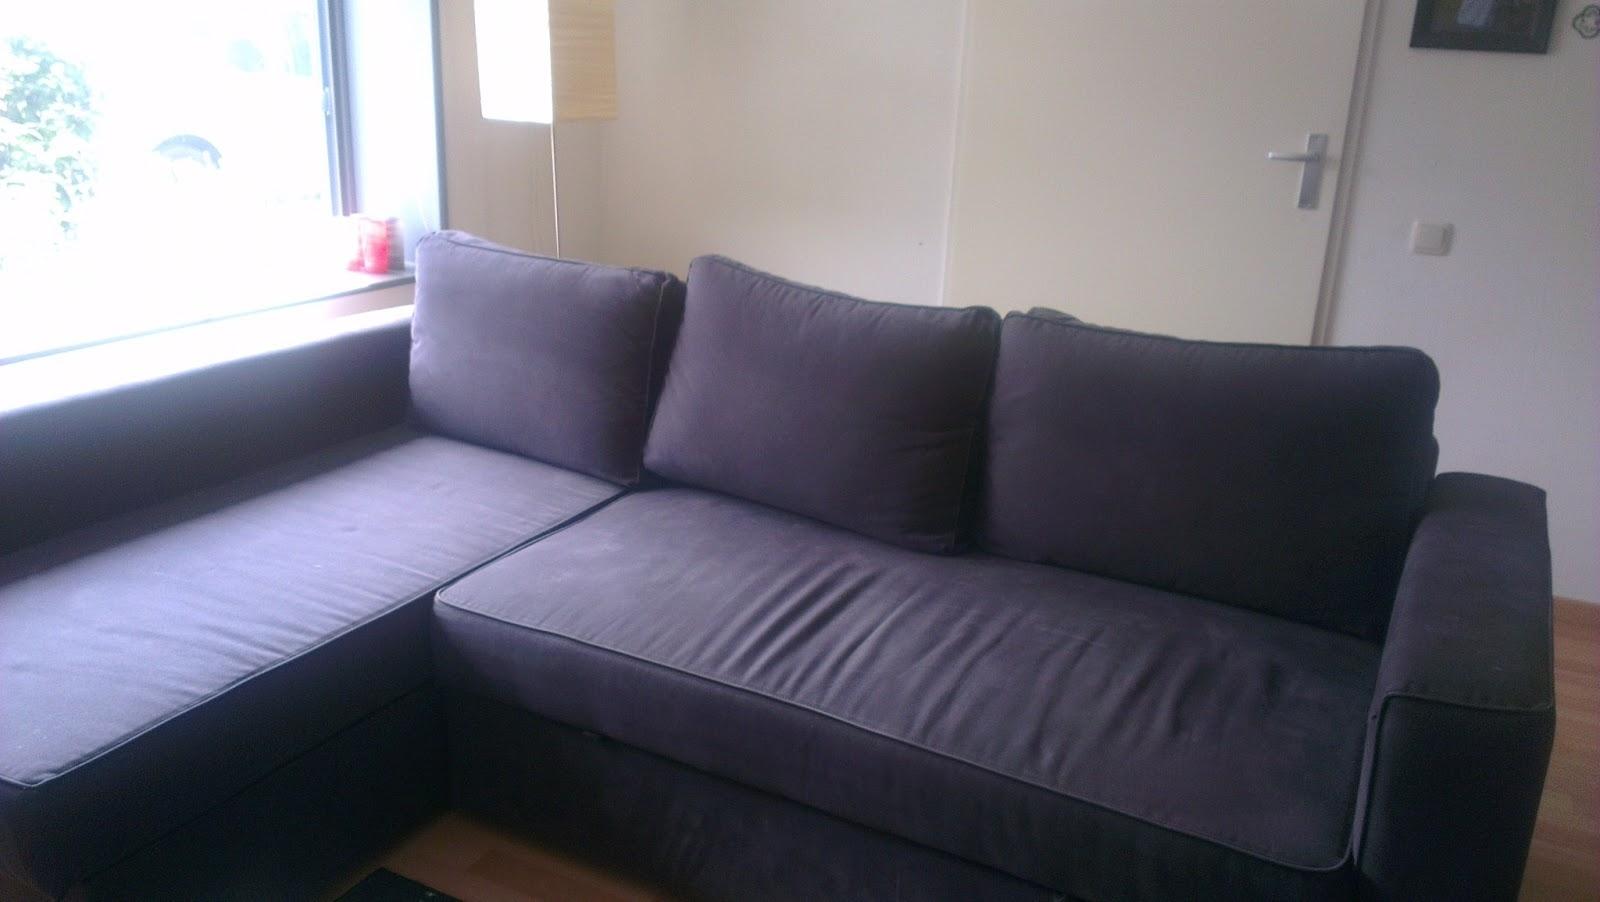 Ace The Adventure: Ikea Vrijdag: Manstad Bank/sofa inside Manstad Sofas (Image 2 of 10)